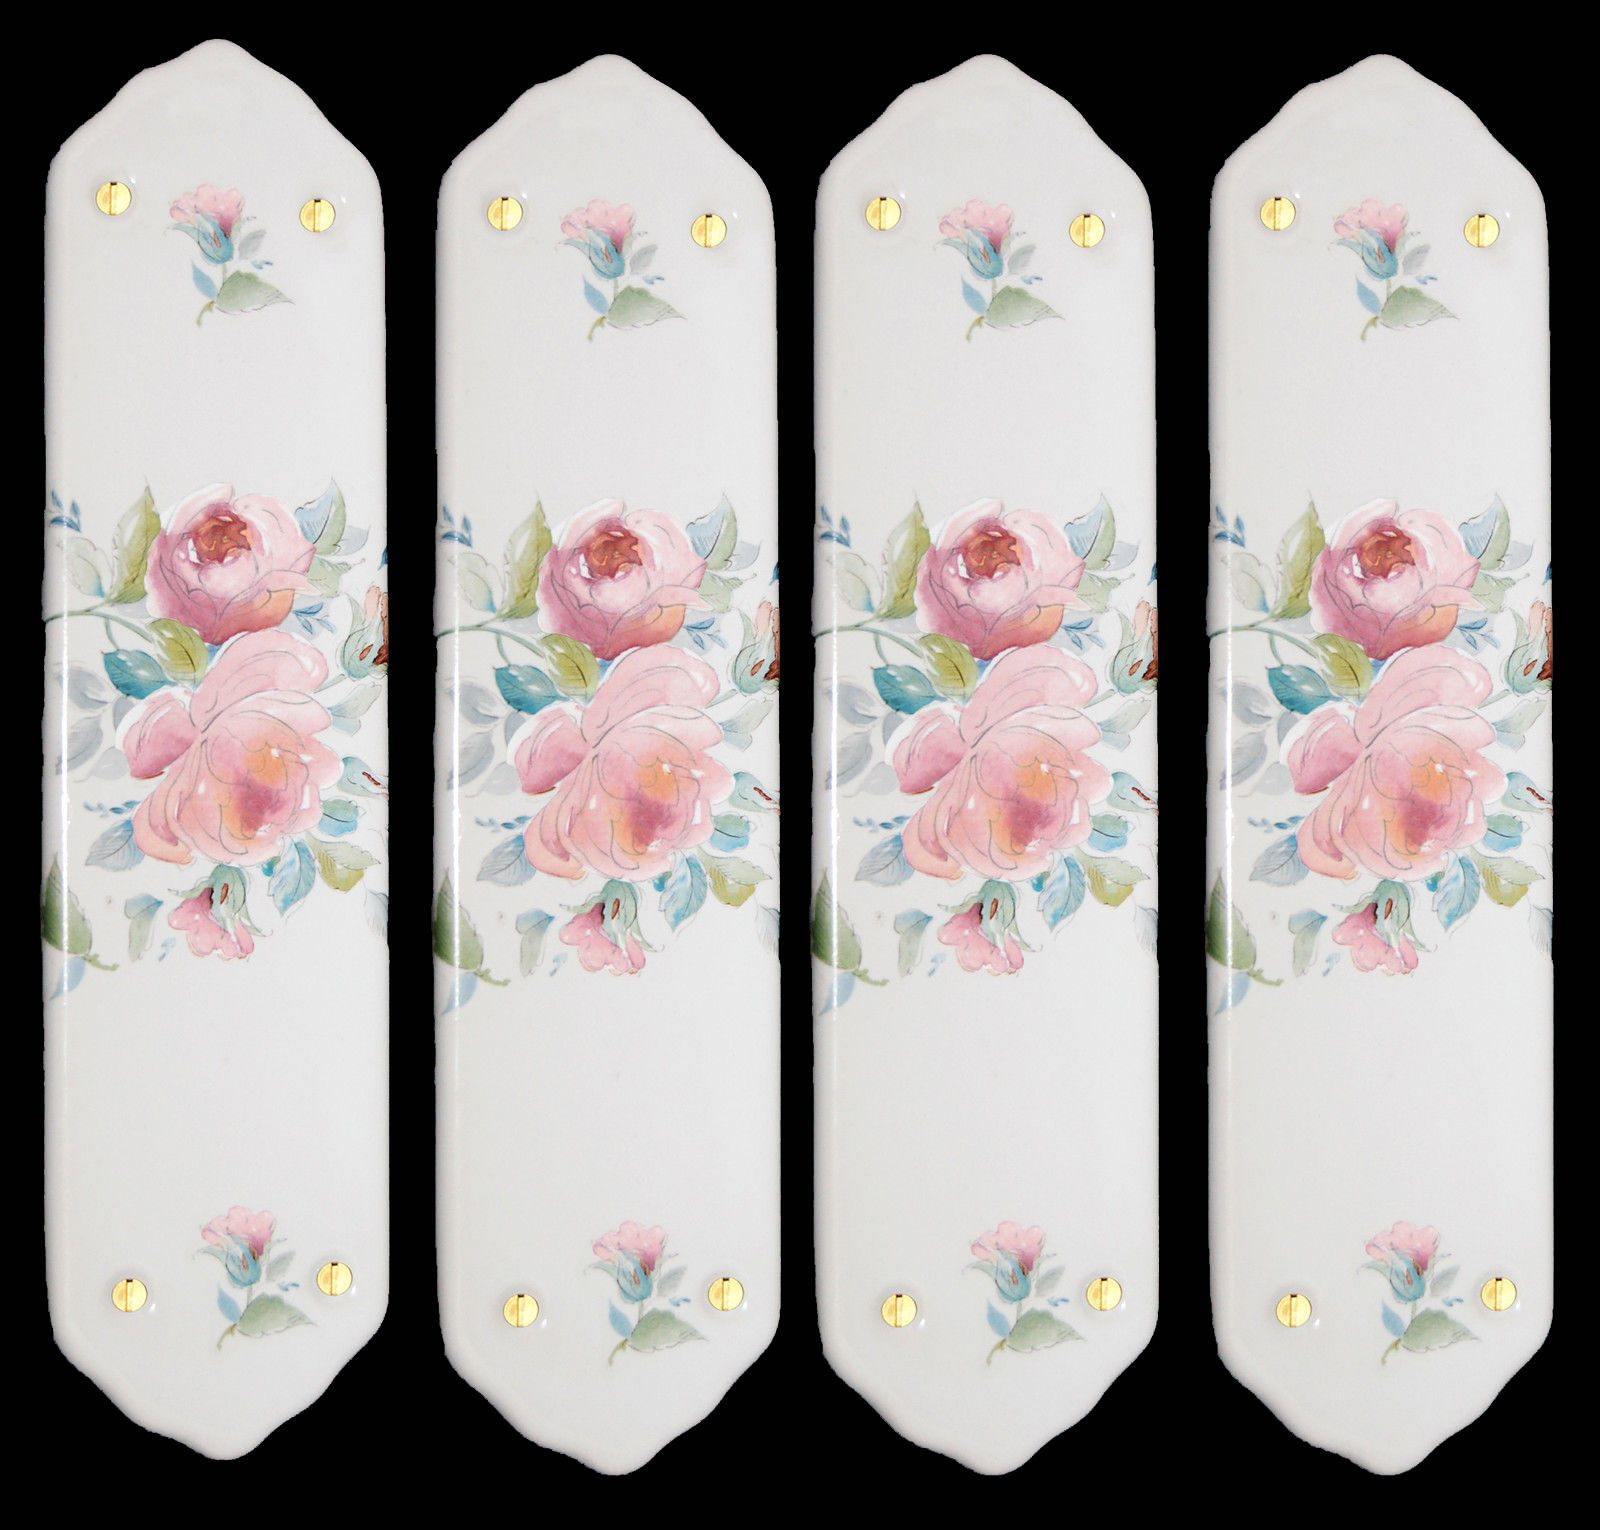 4 x White Porcelain Ceramic Door Finger Push Plates Eleanor Design in Homeu2026  sc 1 st  Pinterest & 4 x White Porcelain Ceramic Door Finger Push Plates Eleanor Design ...